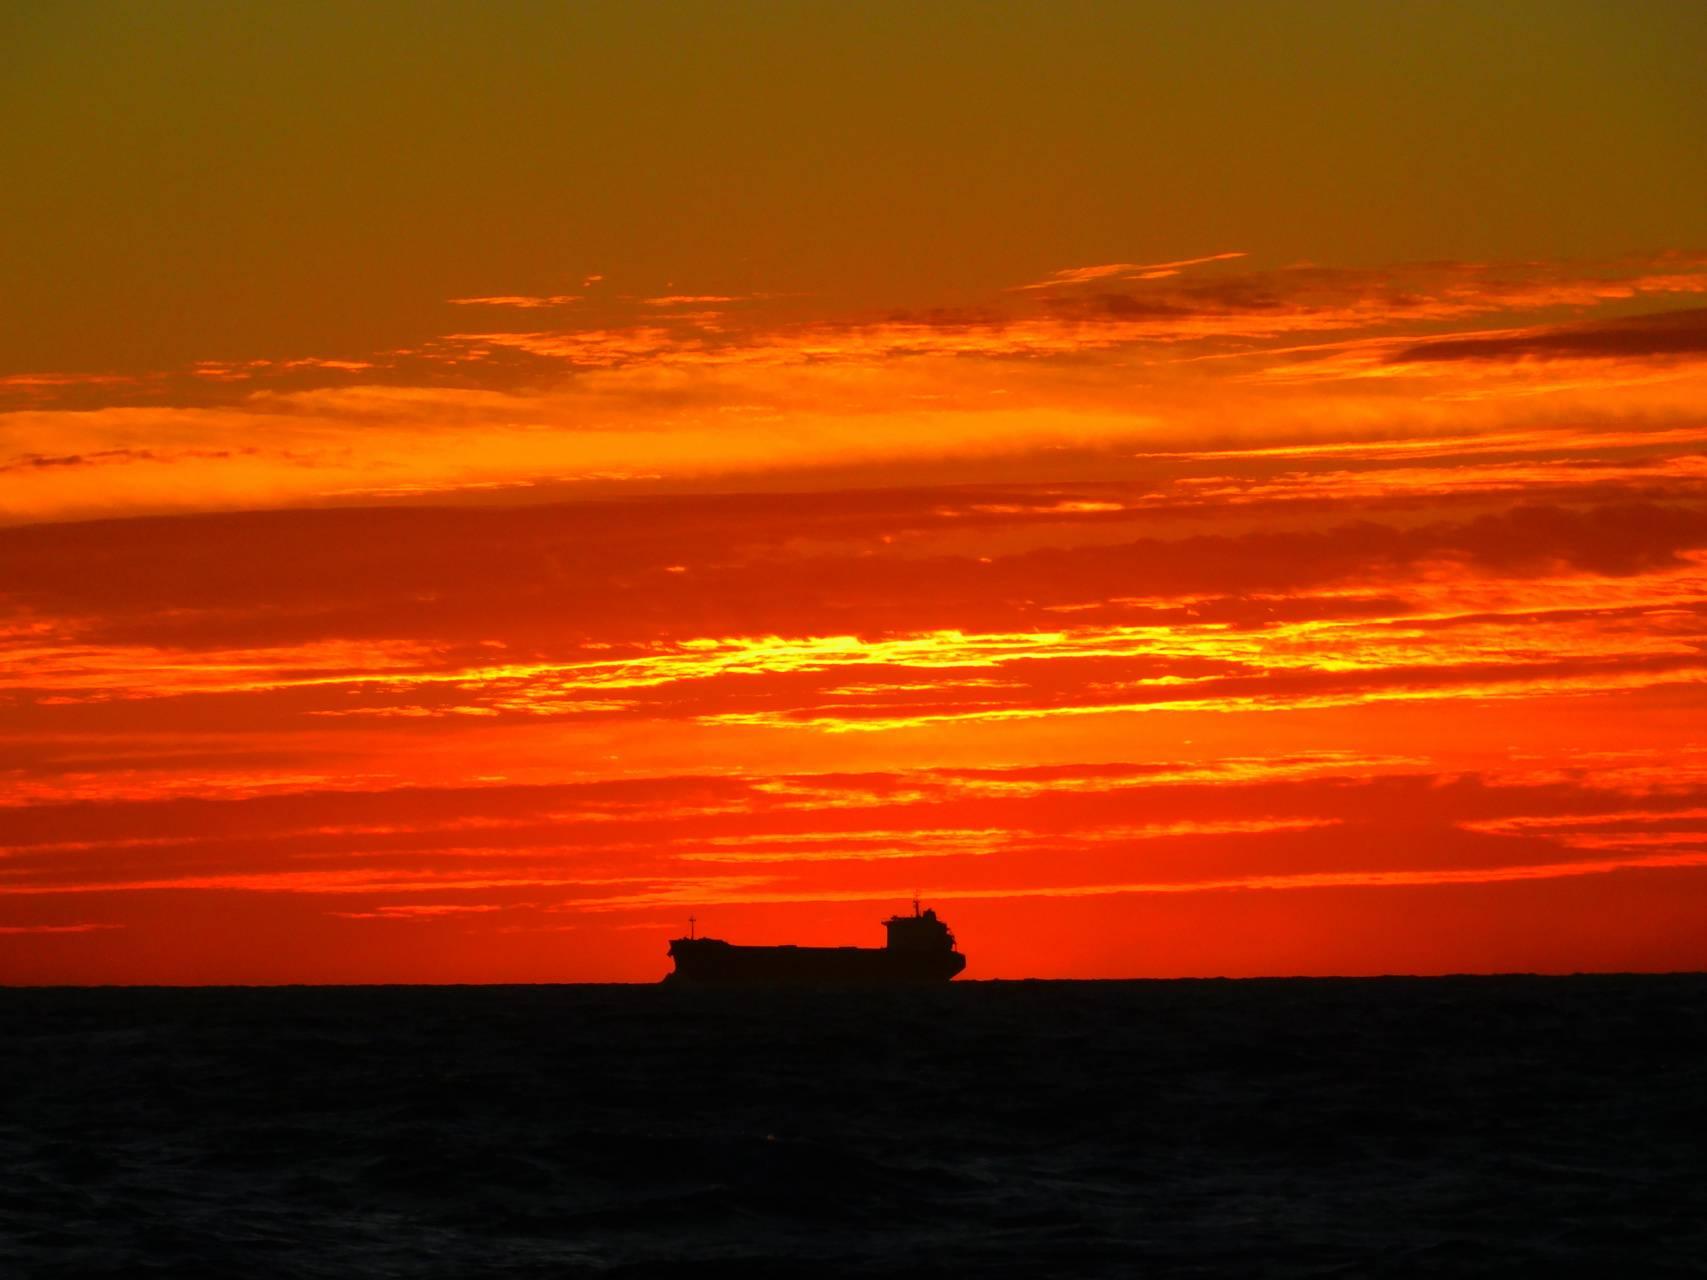 Gulf Ship Silhouette